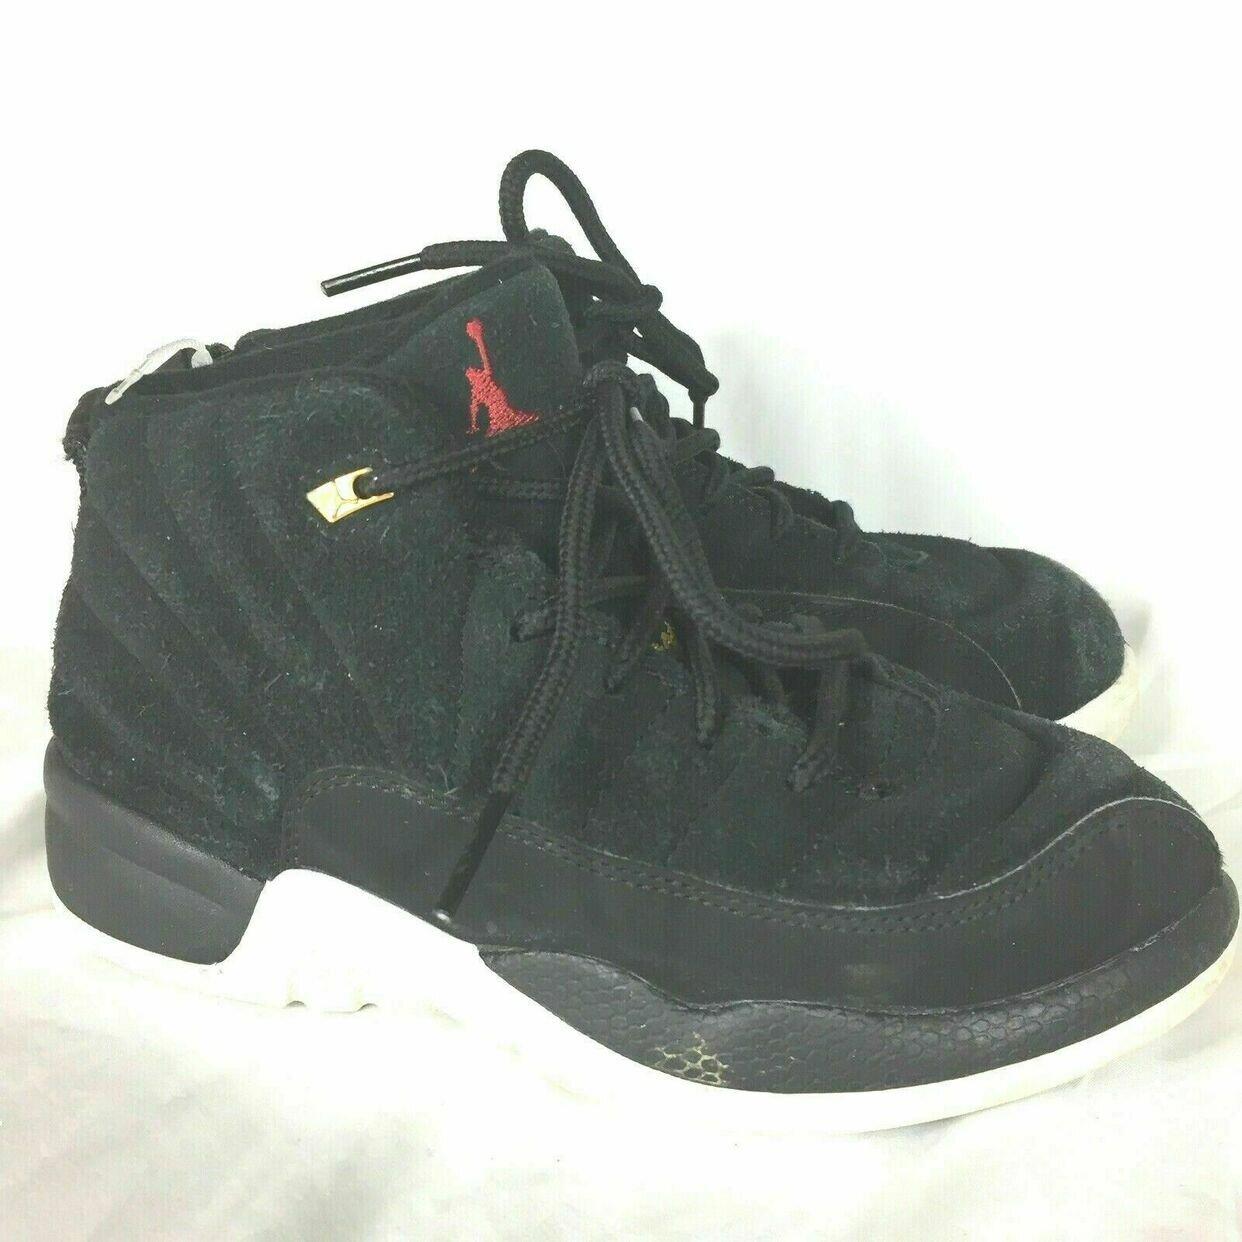 Nike Air Jordan XII 12 Retro Reverse Taxi Kids Shoes Size 13C ...